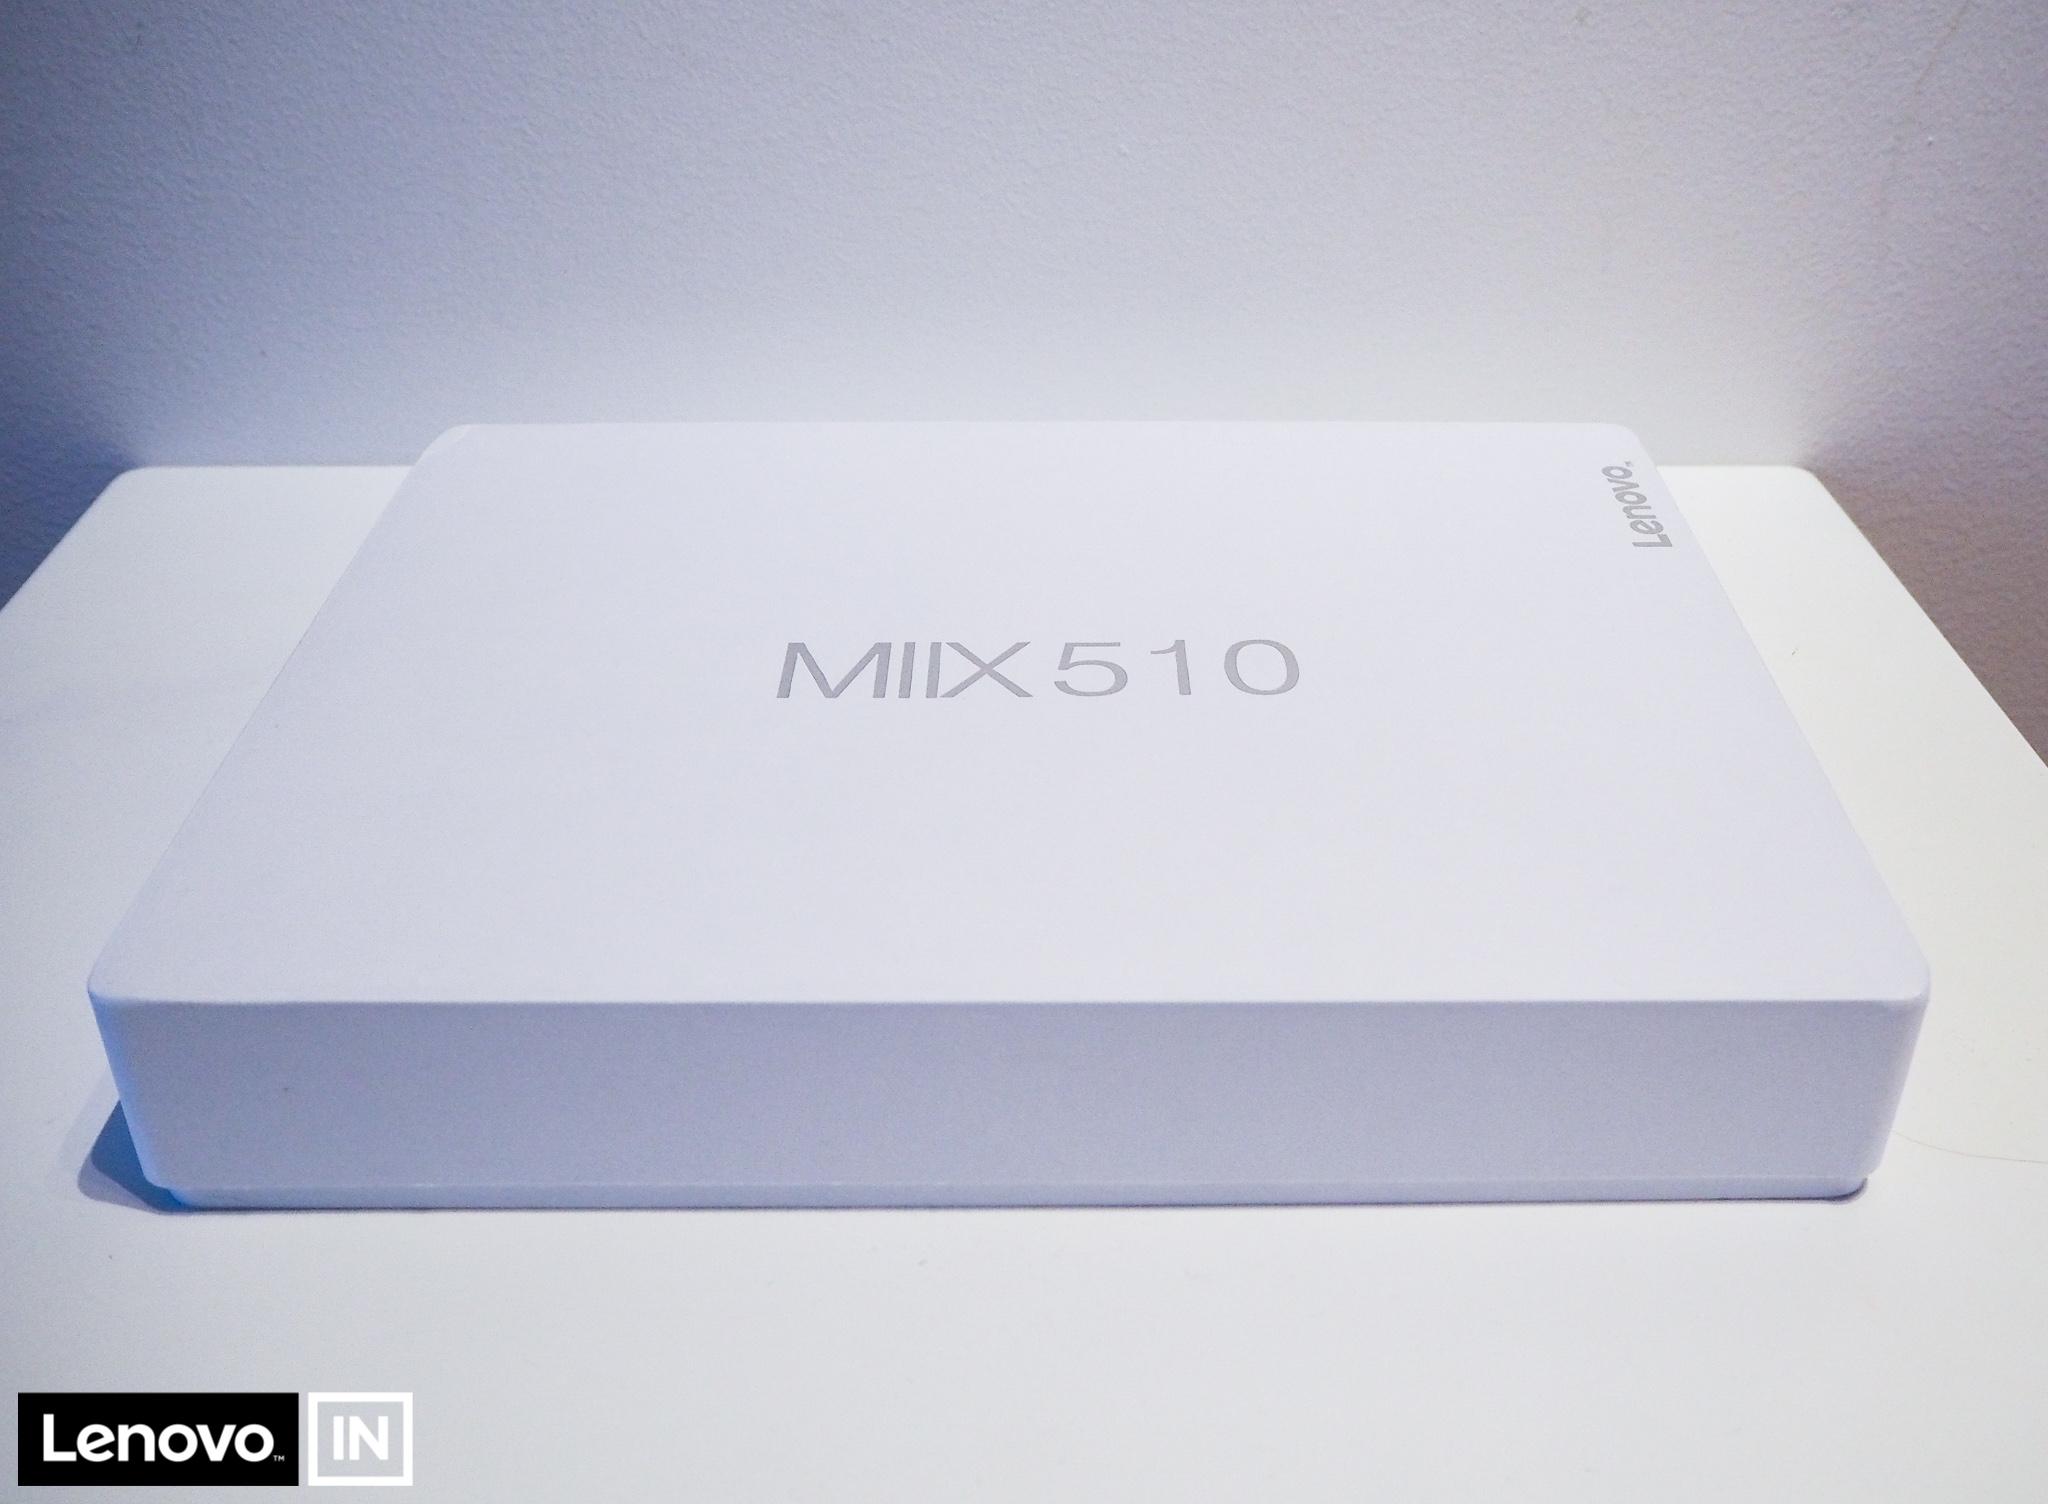 lenovo miix 510 hands on review lenard s corner on the web